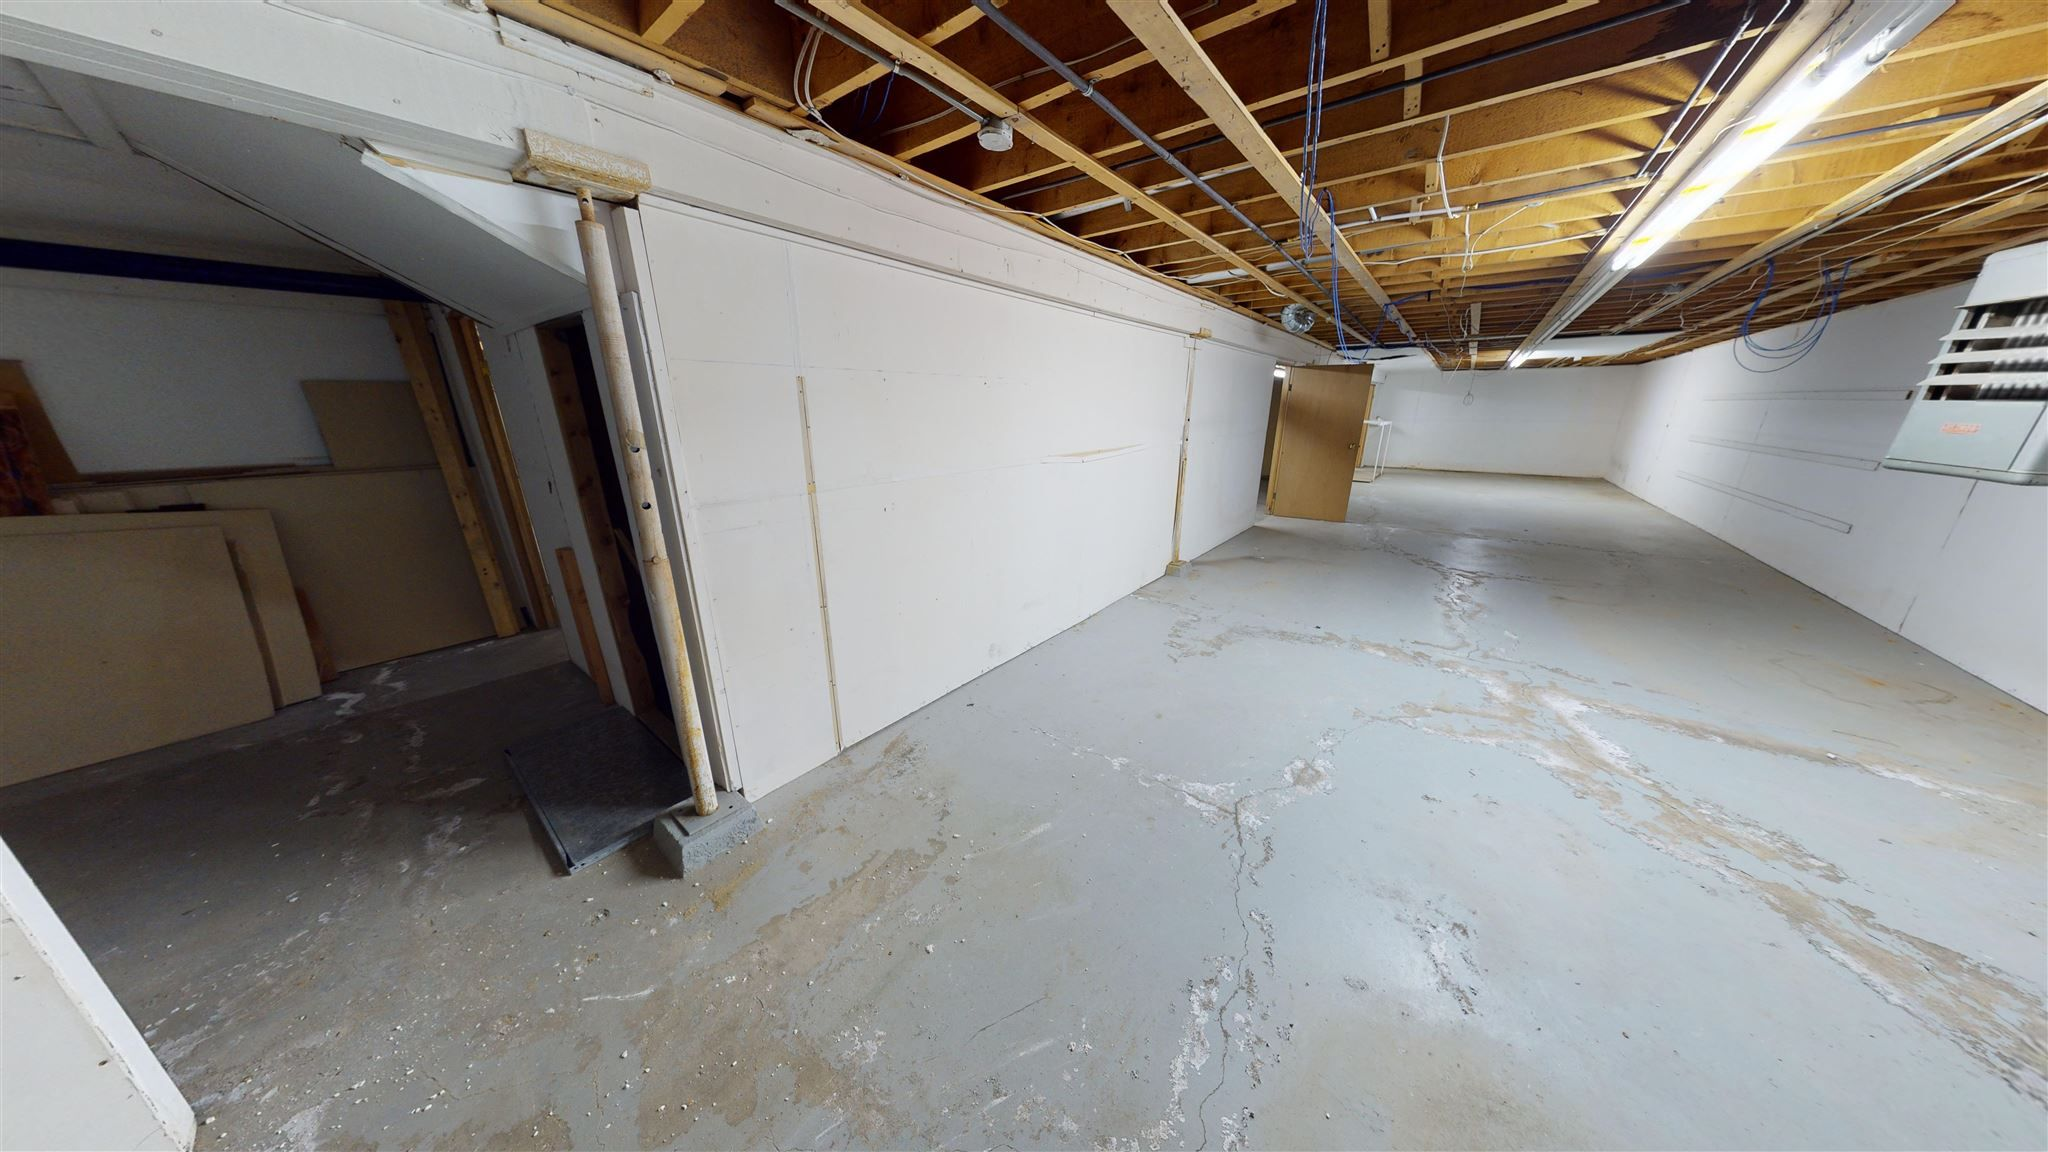 Photo 33: Photos: 10067 100 Avenue in Fort St. John: Fort St. John - City NW Office for sale (Fort St. John (Zone 60))  : MLS®# C8039097